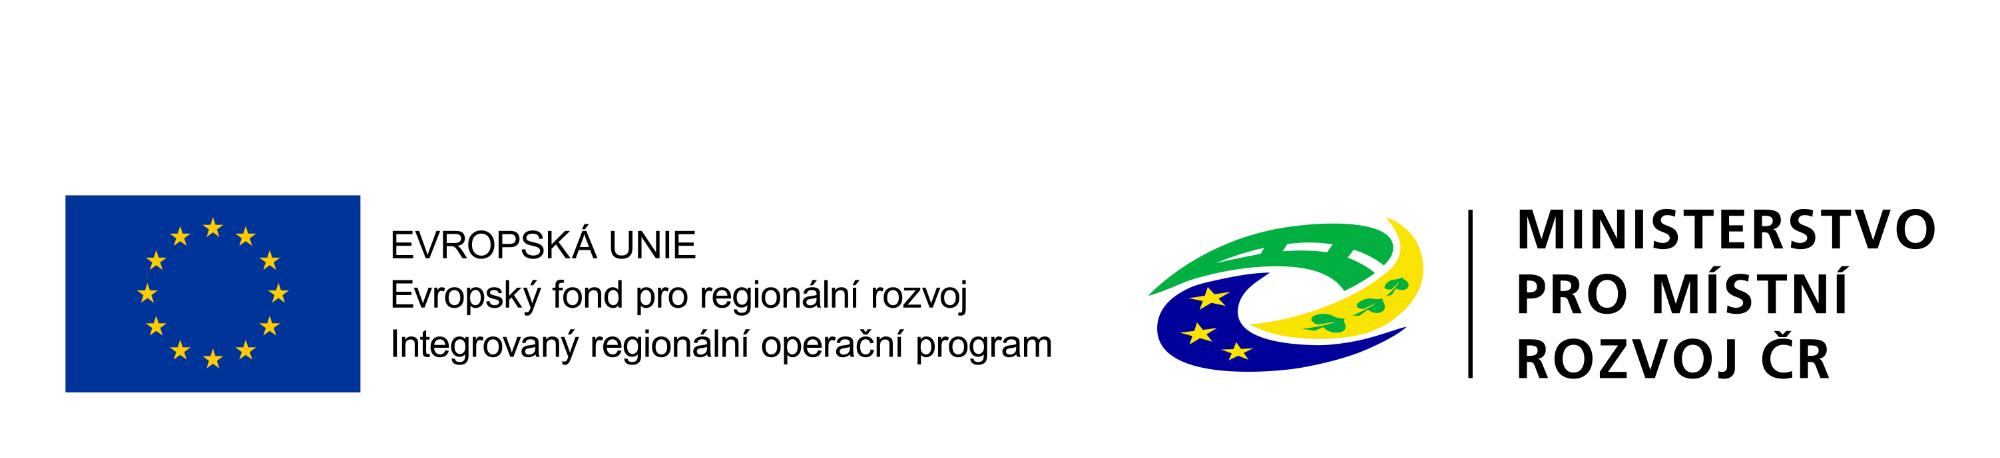 Projekt NZDM Kamin ÚO Vybavení služby